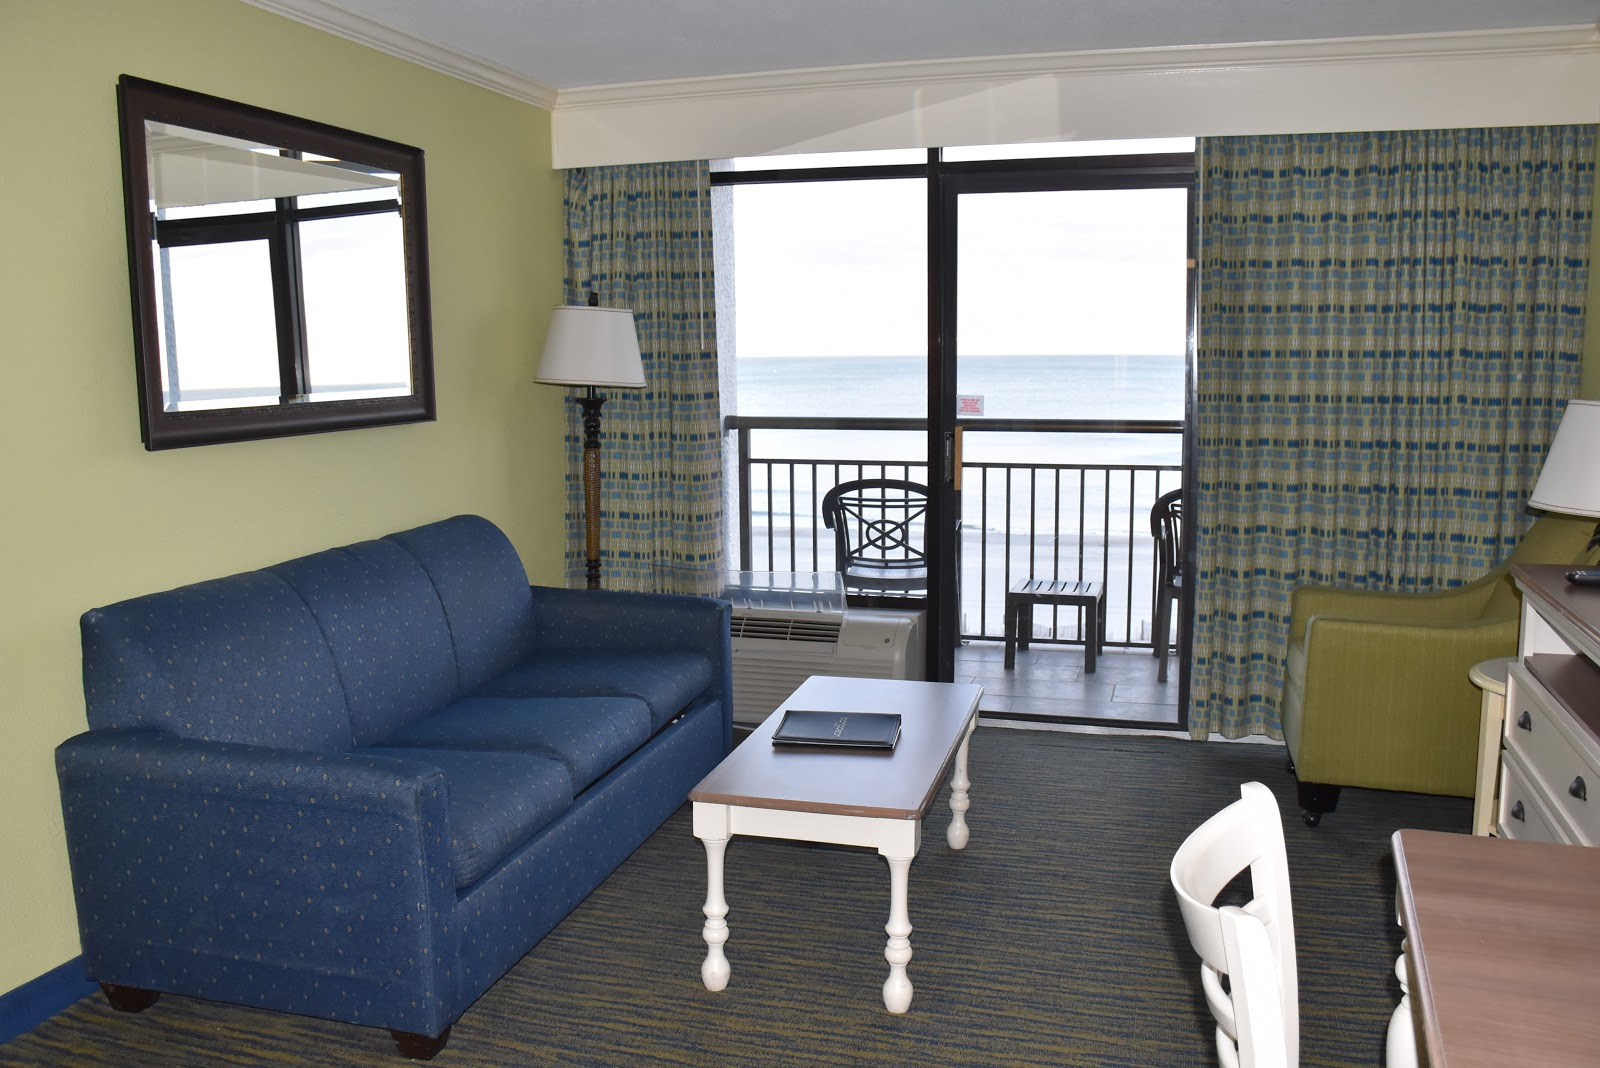 Living Room in Caribbean Resort and Villas in Myrtle Beach